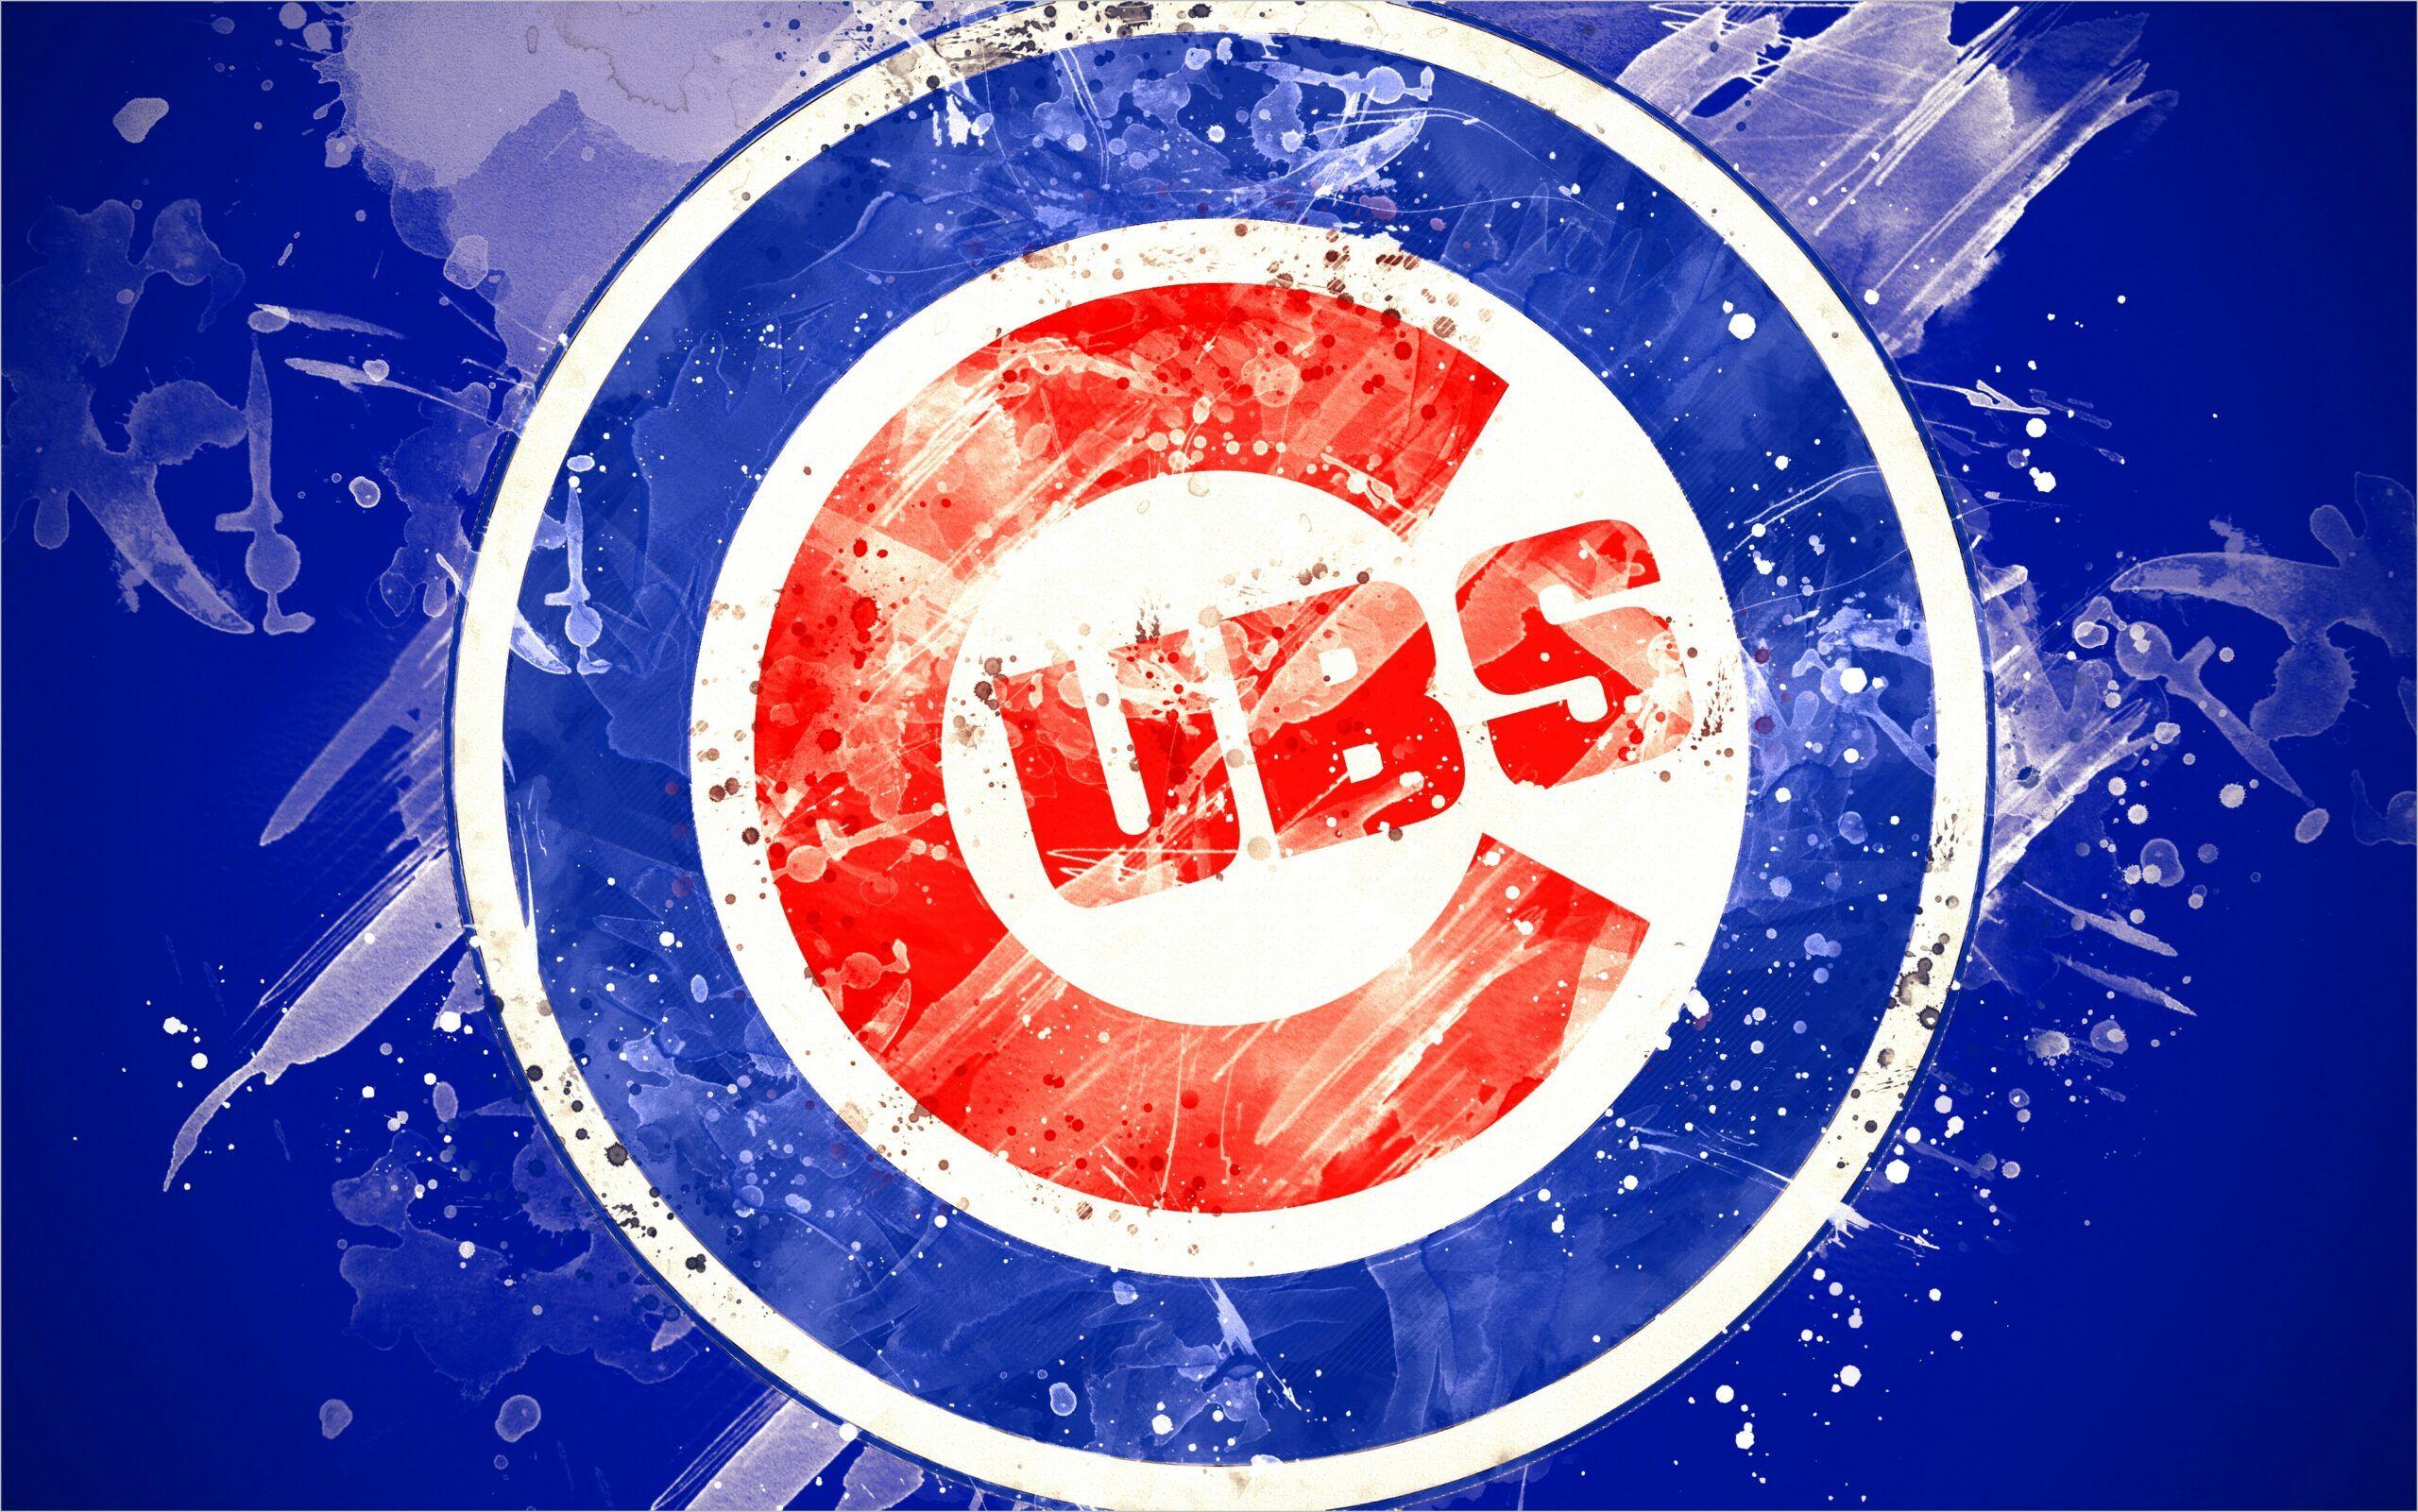 Chicago Cubs Wallpaper 4k In 2020 Cubs Wallpaper Chicago Cubs Wallpaper Chicago Cubs